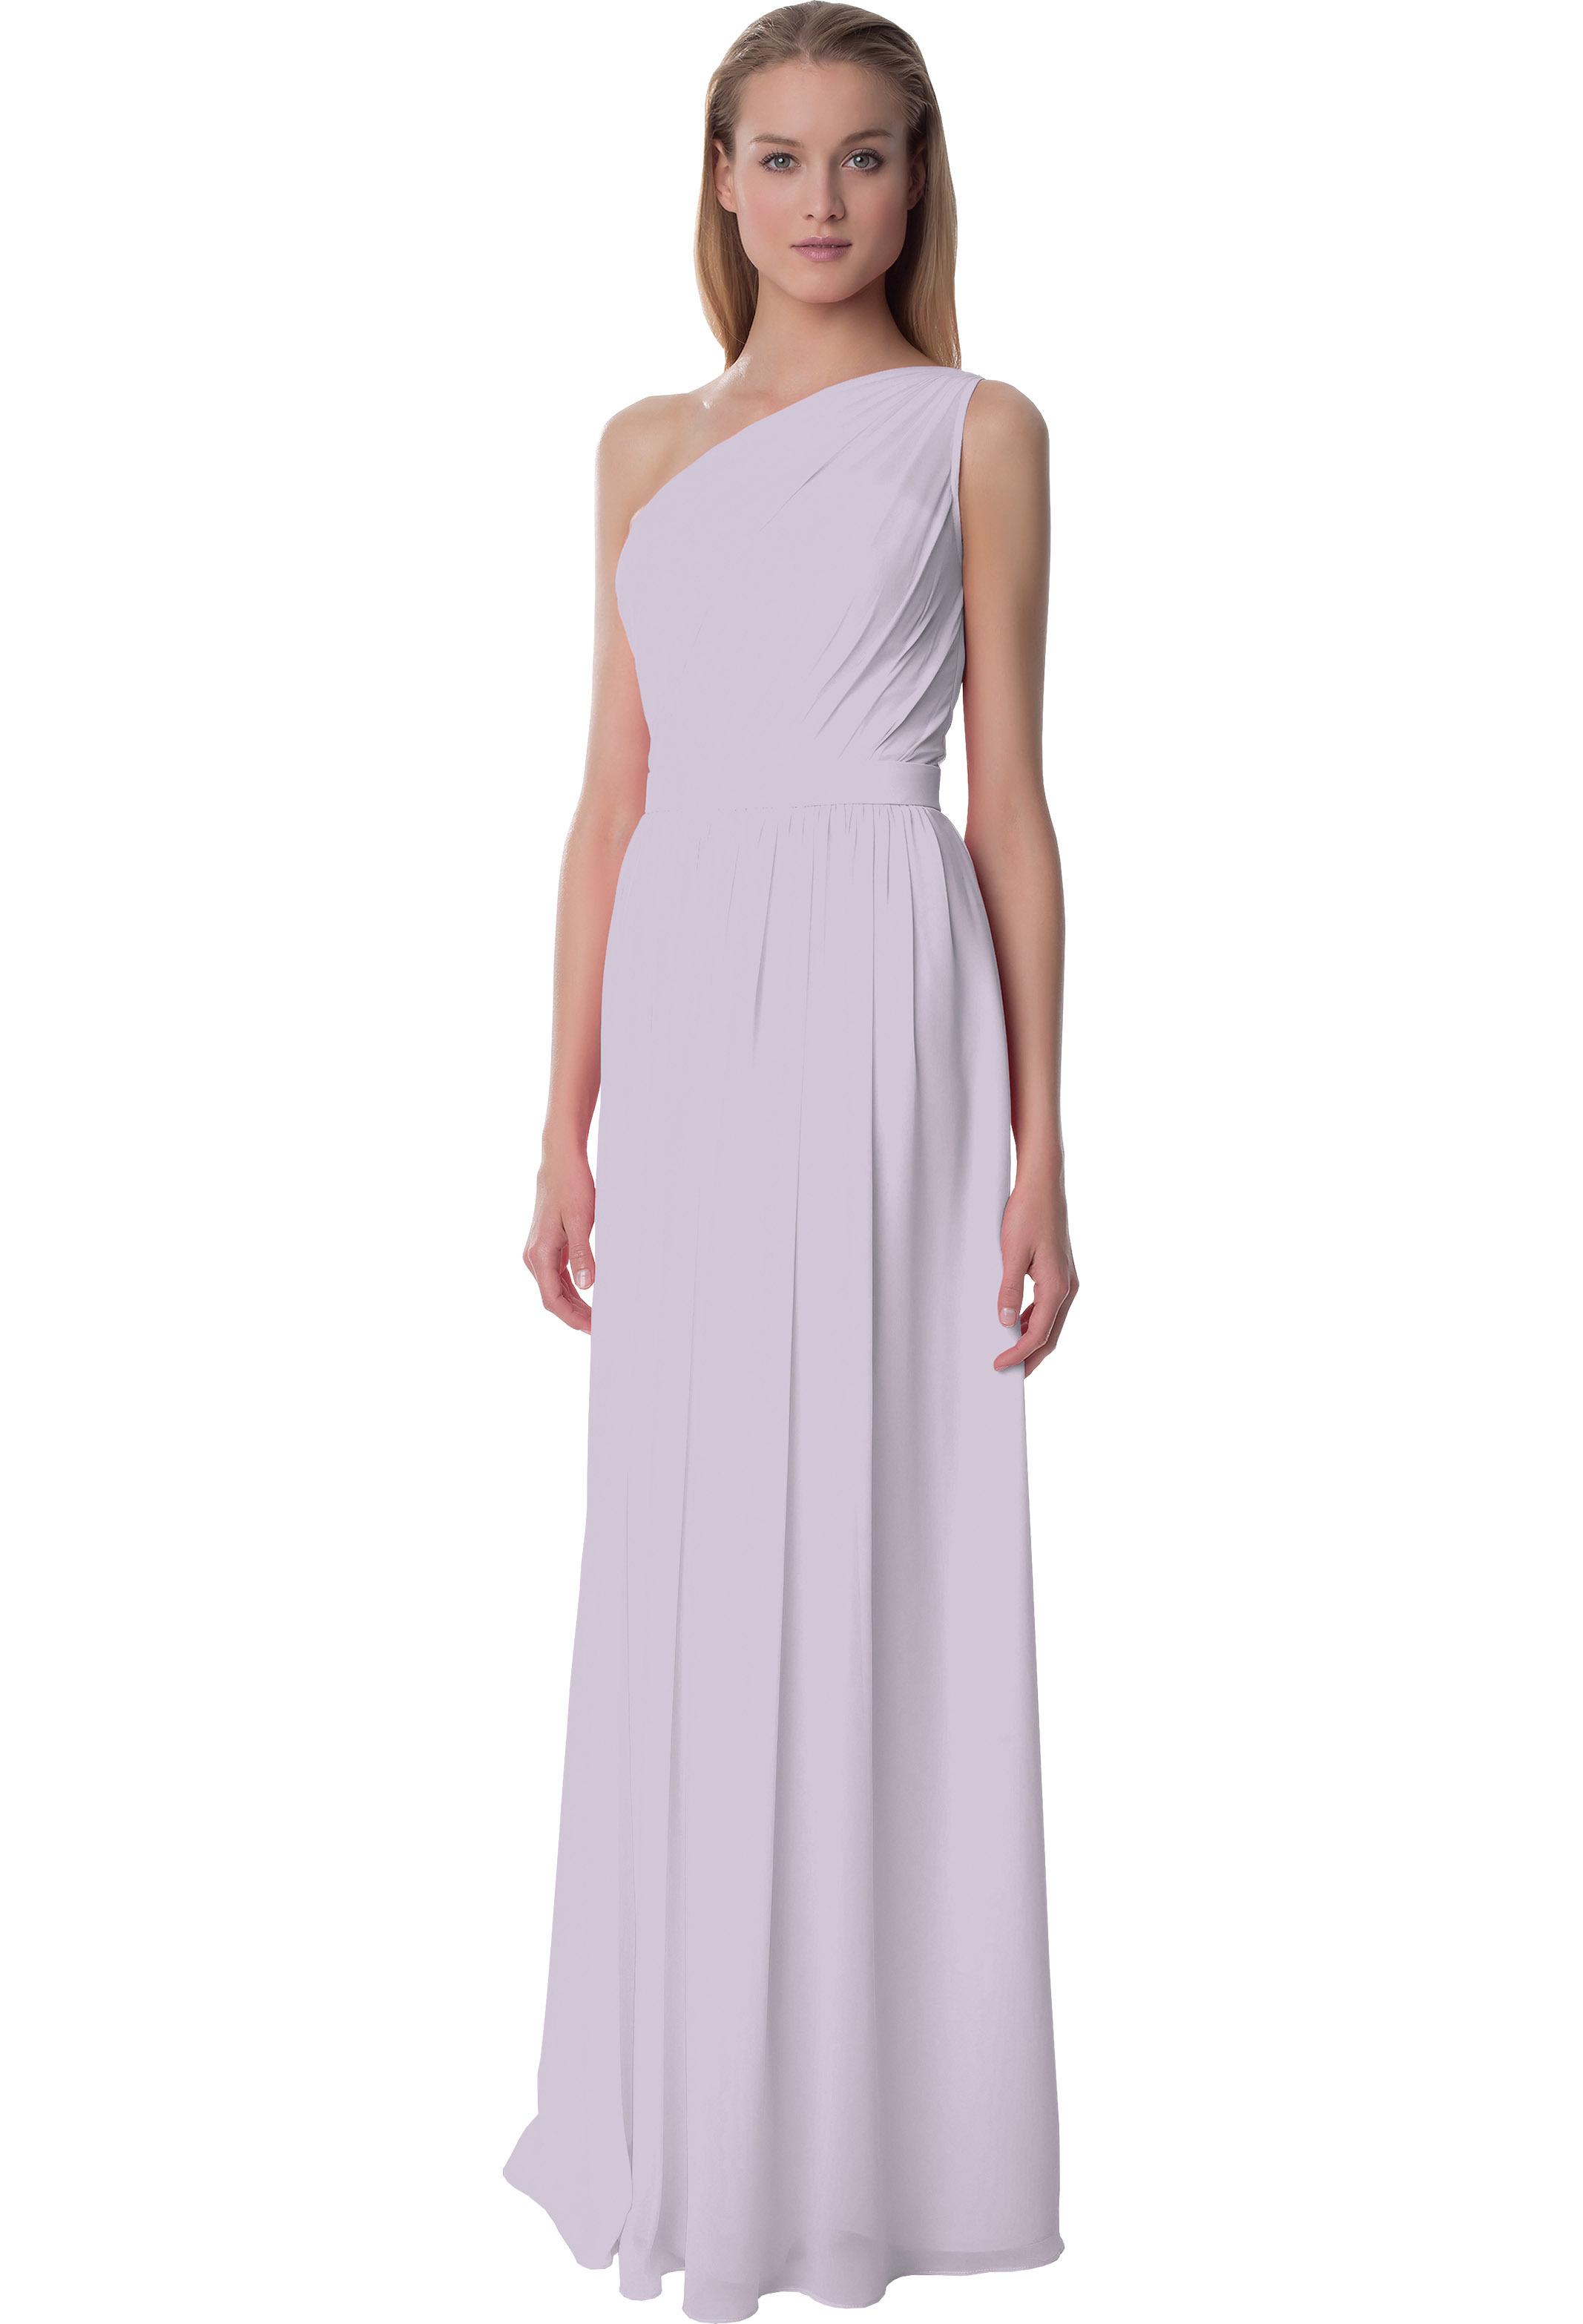 Bill Levkoff VIOLET Chiffon One Shoulder A-line gown, $220.00 Front